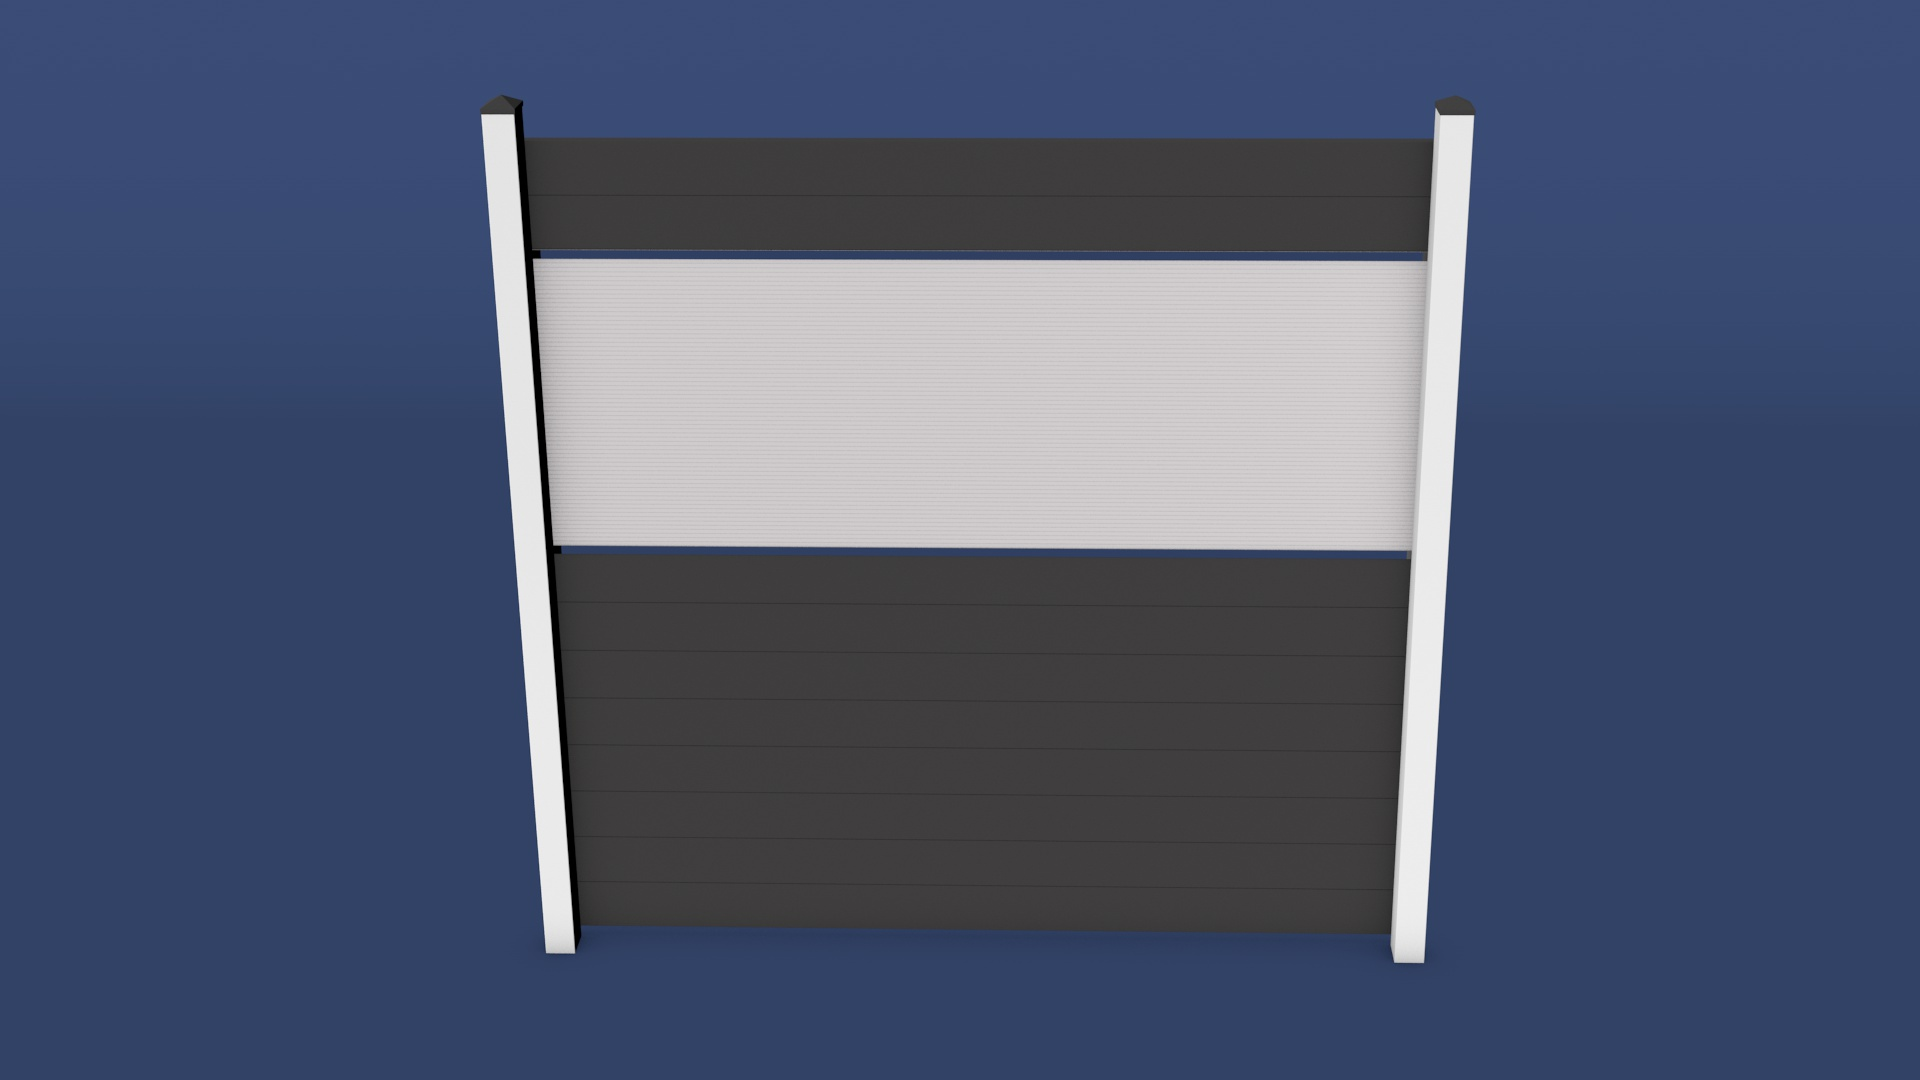 Kunststoff Zaun Kolja Idealer Sichtschutzzaun in 2000 x 2000 mm